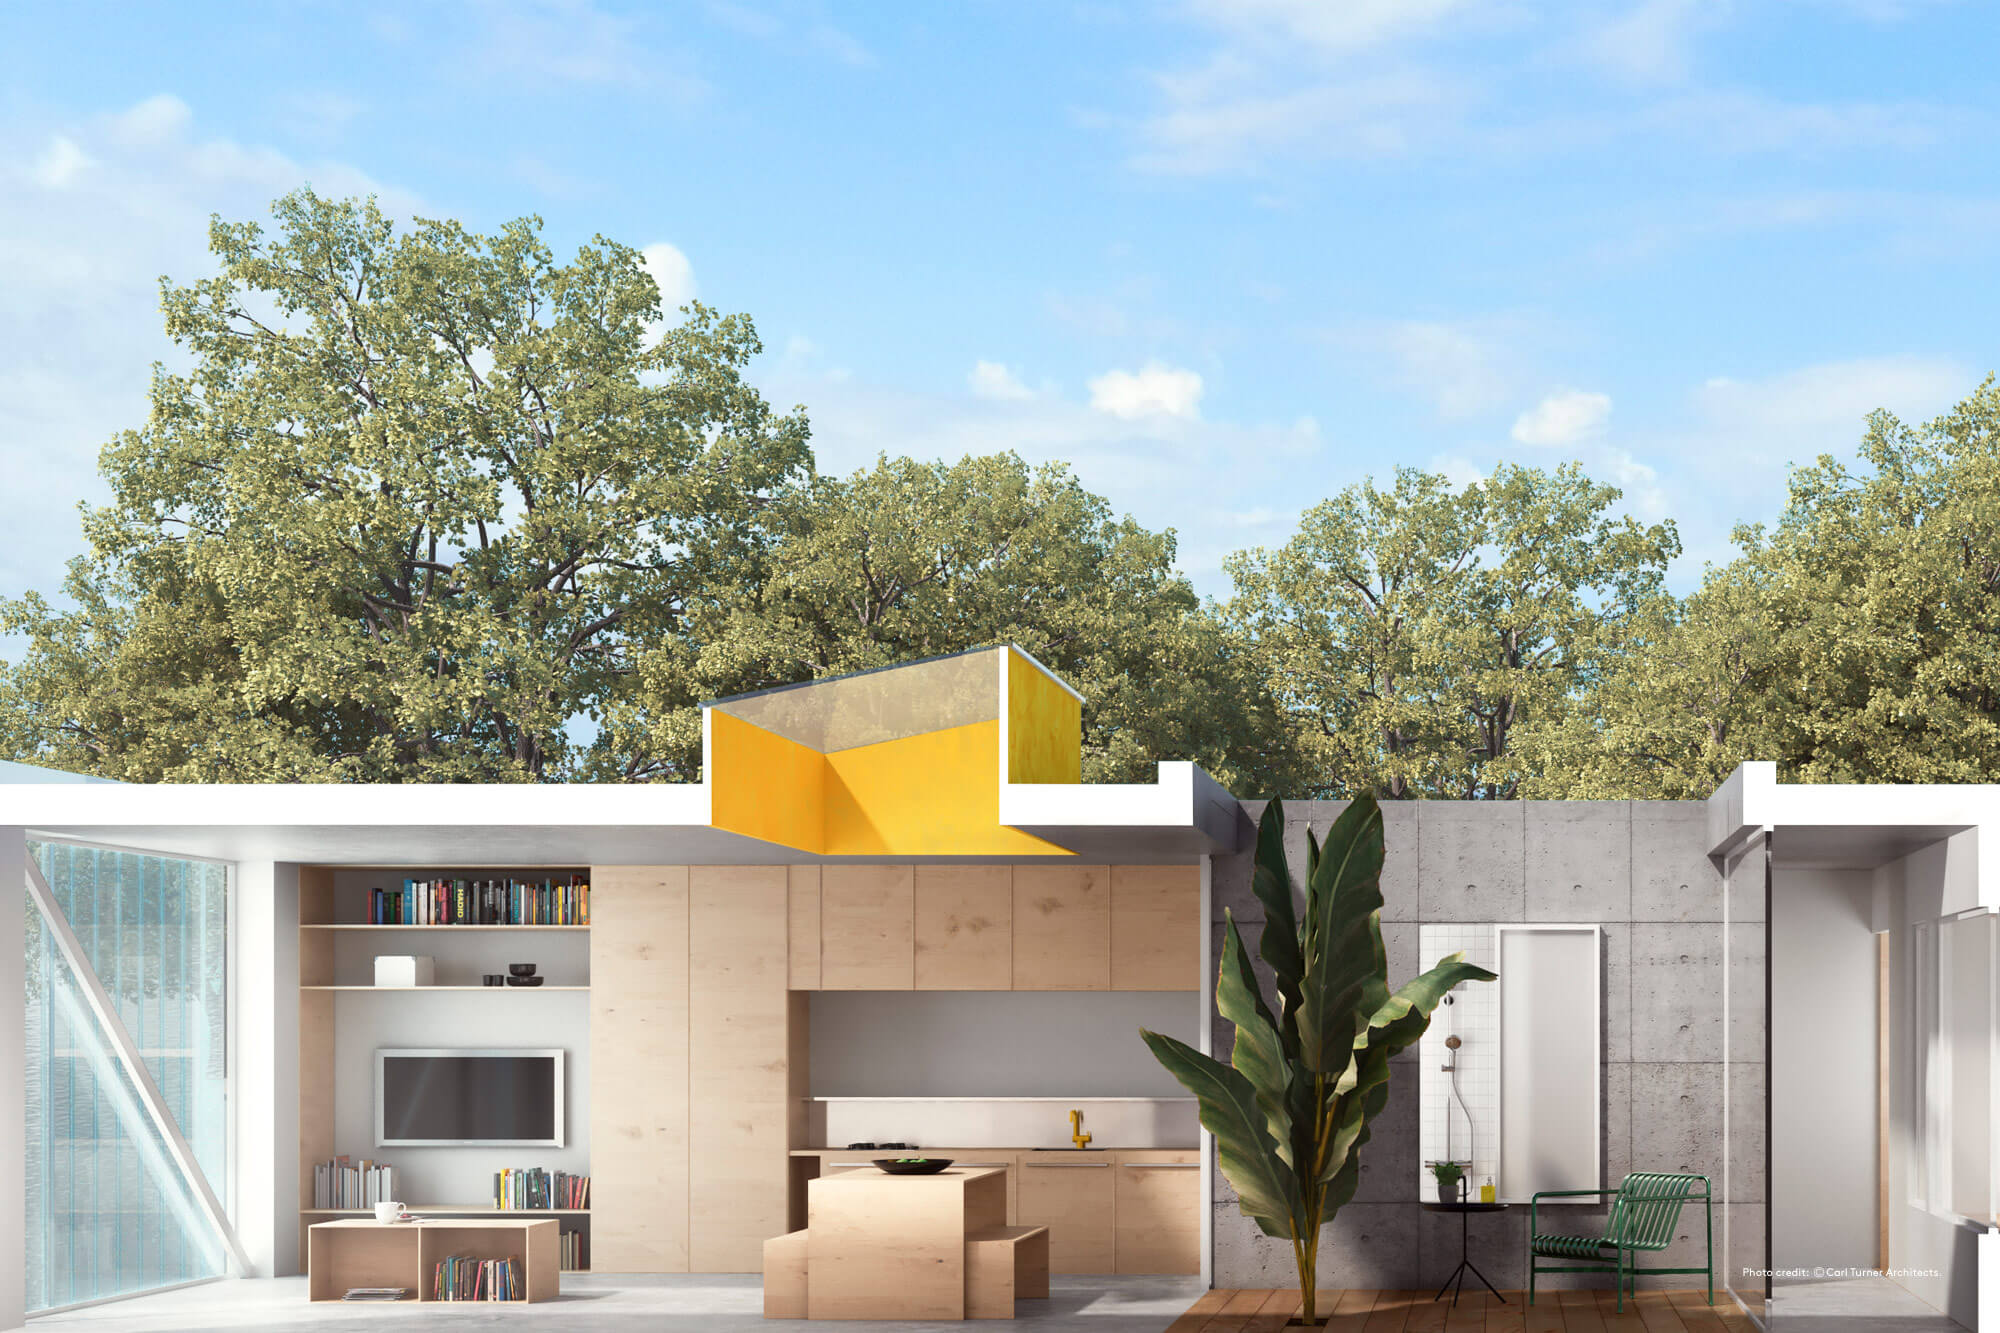 gpj-studio-cube-haus-architects-website-cs-05